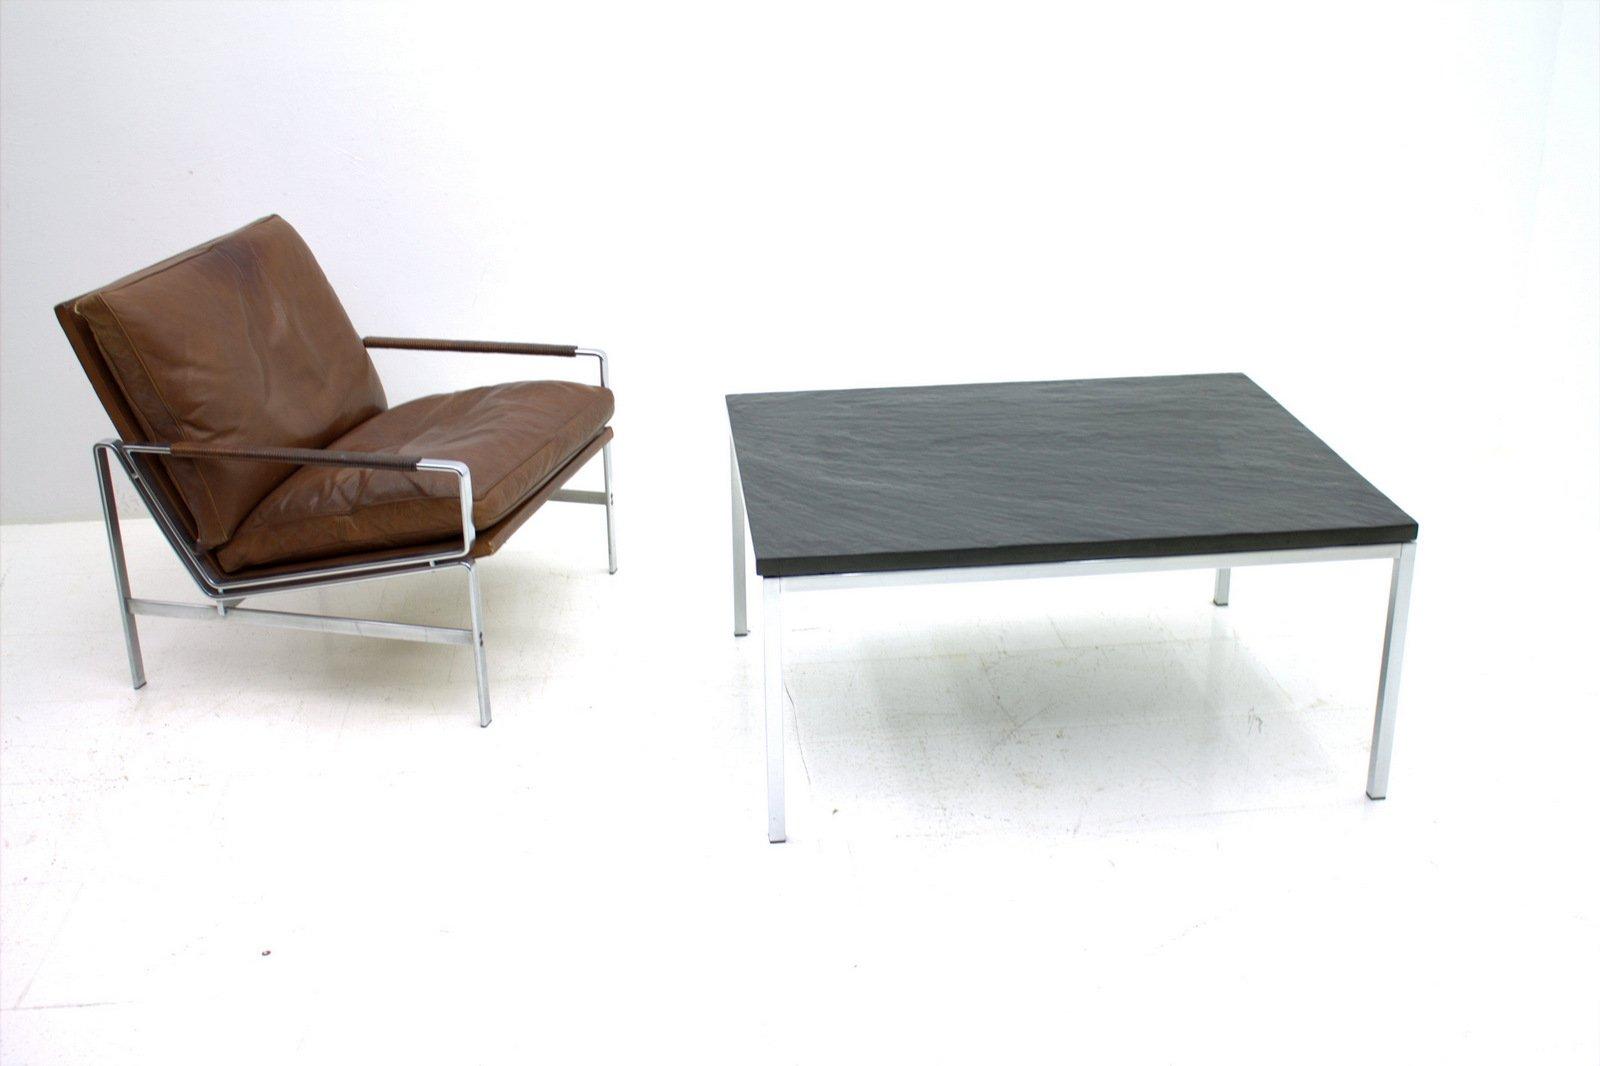 table basse par florence knoll bassett pour knoll en vente. Black Bedroom Furniture Sets. Home Design Ideas